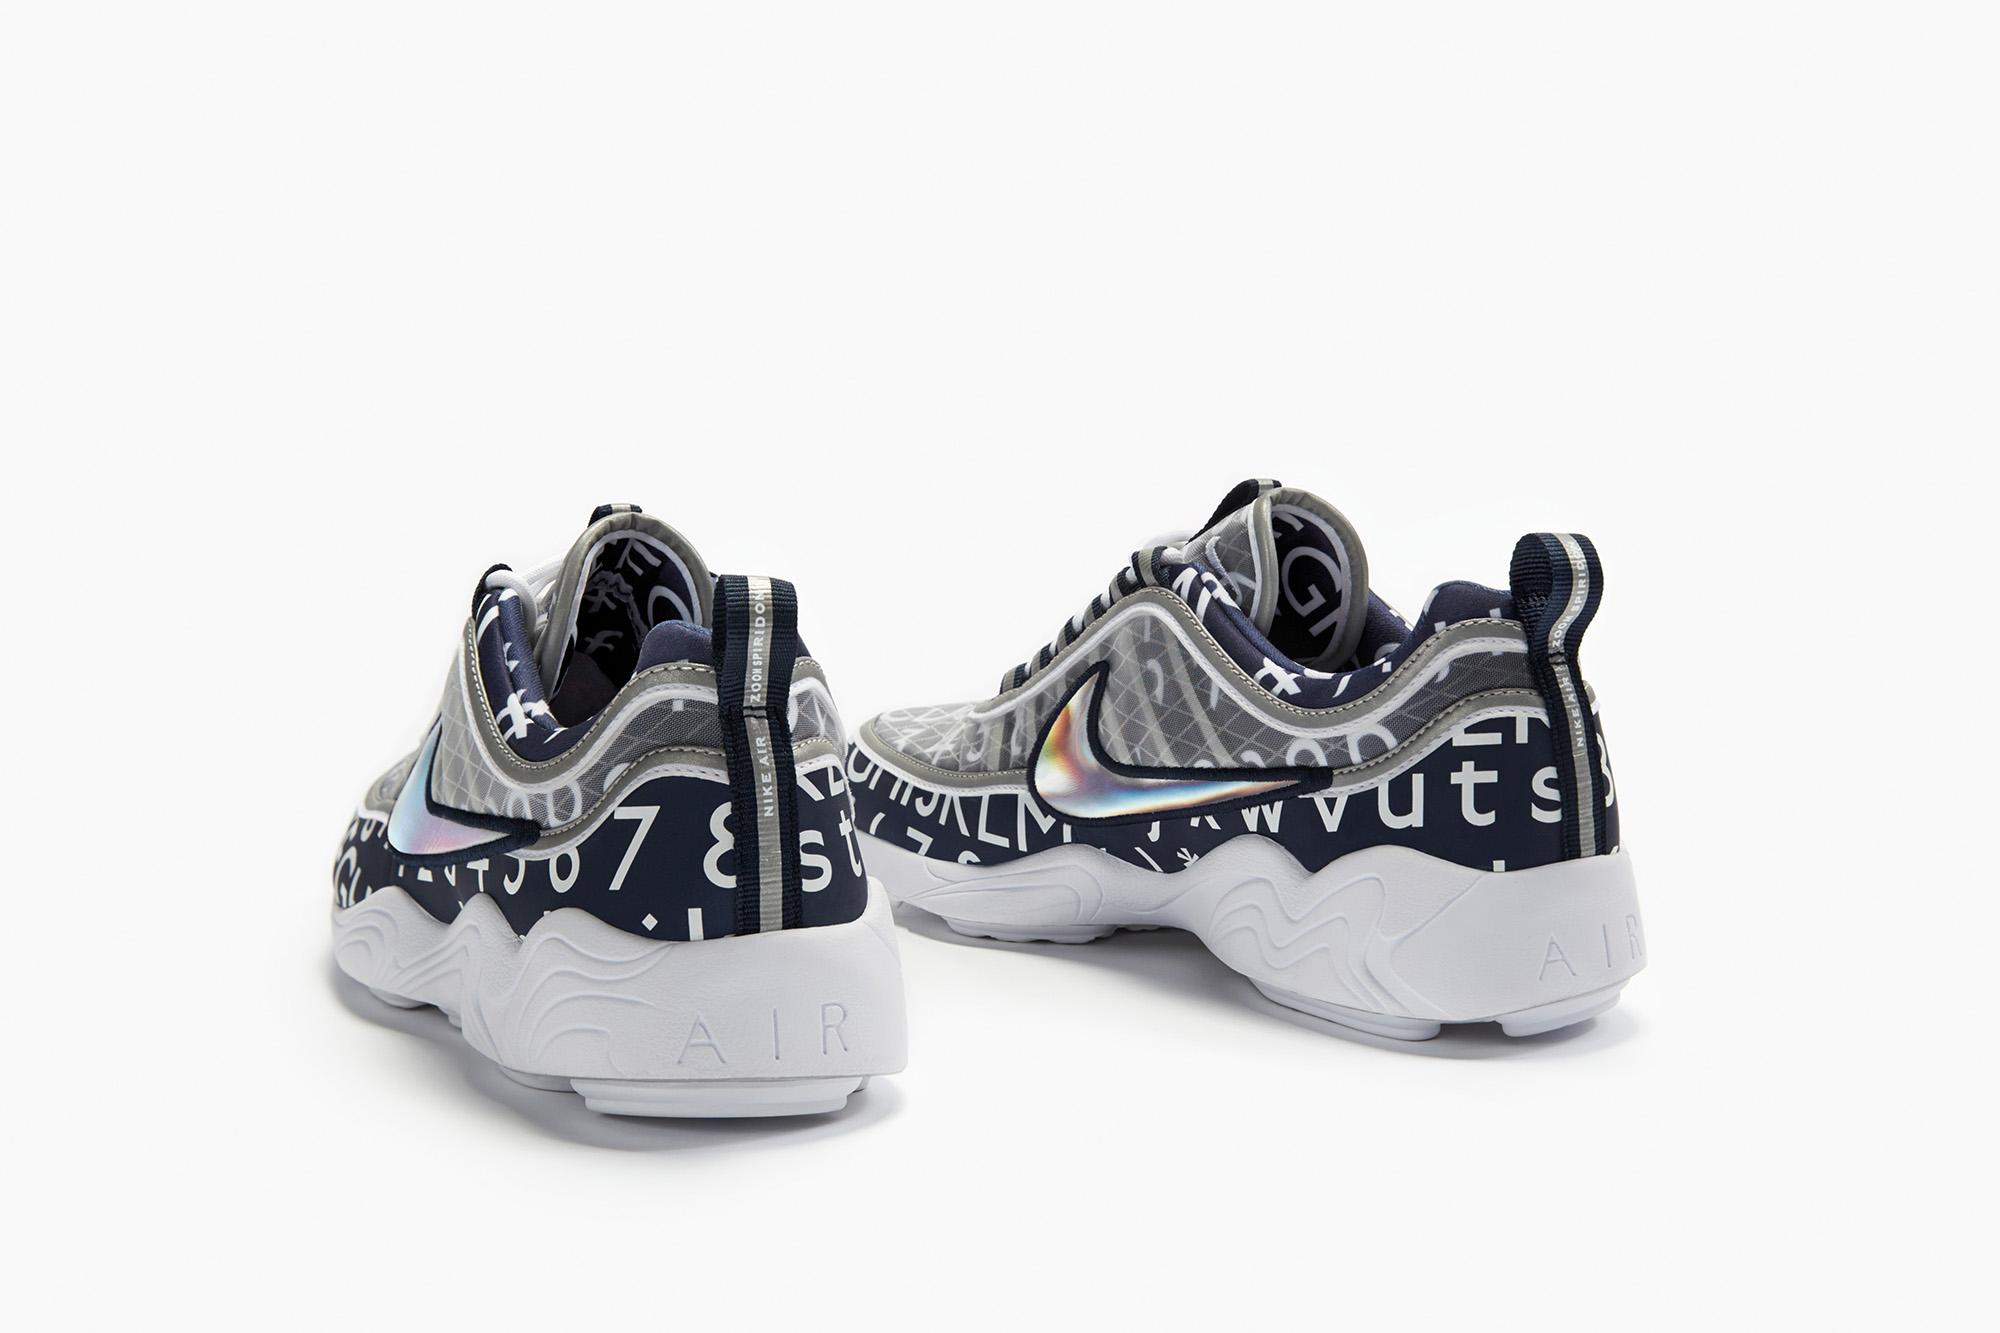 Wholesale Retro Jordans Paypal   Linamar